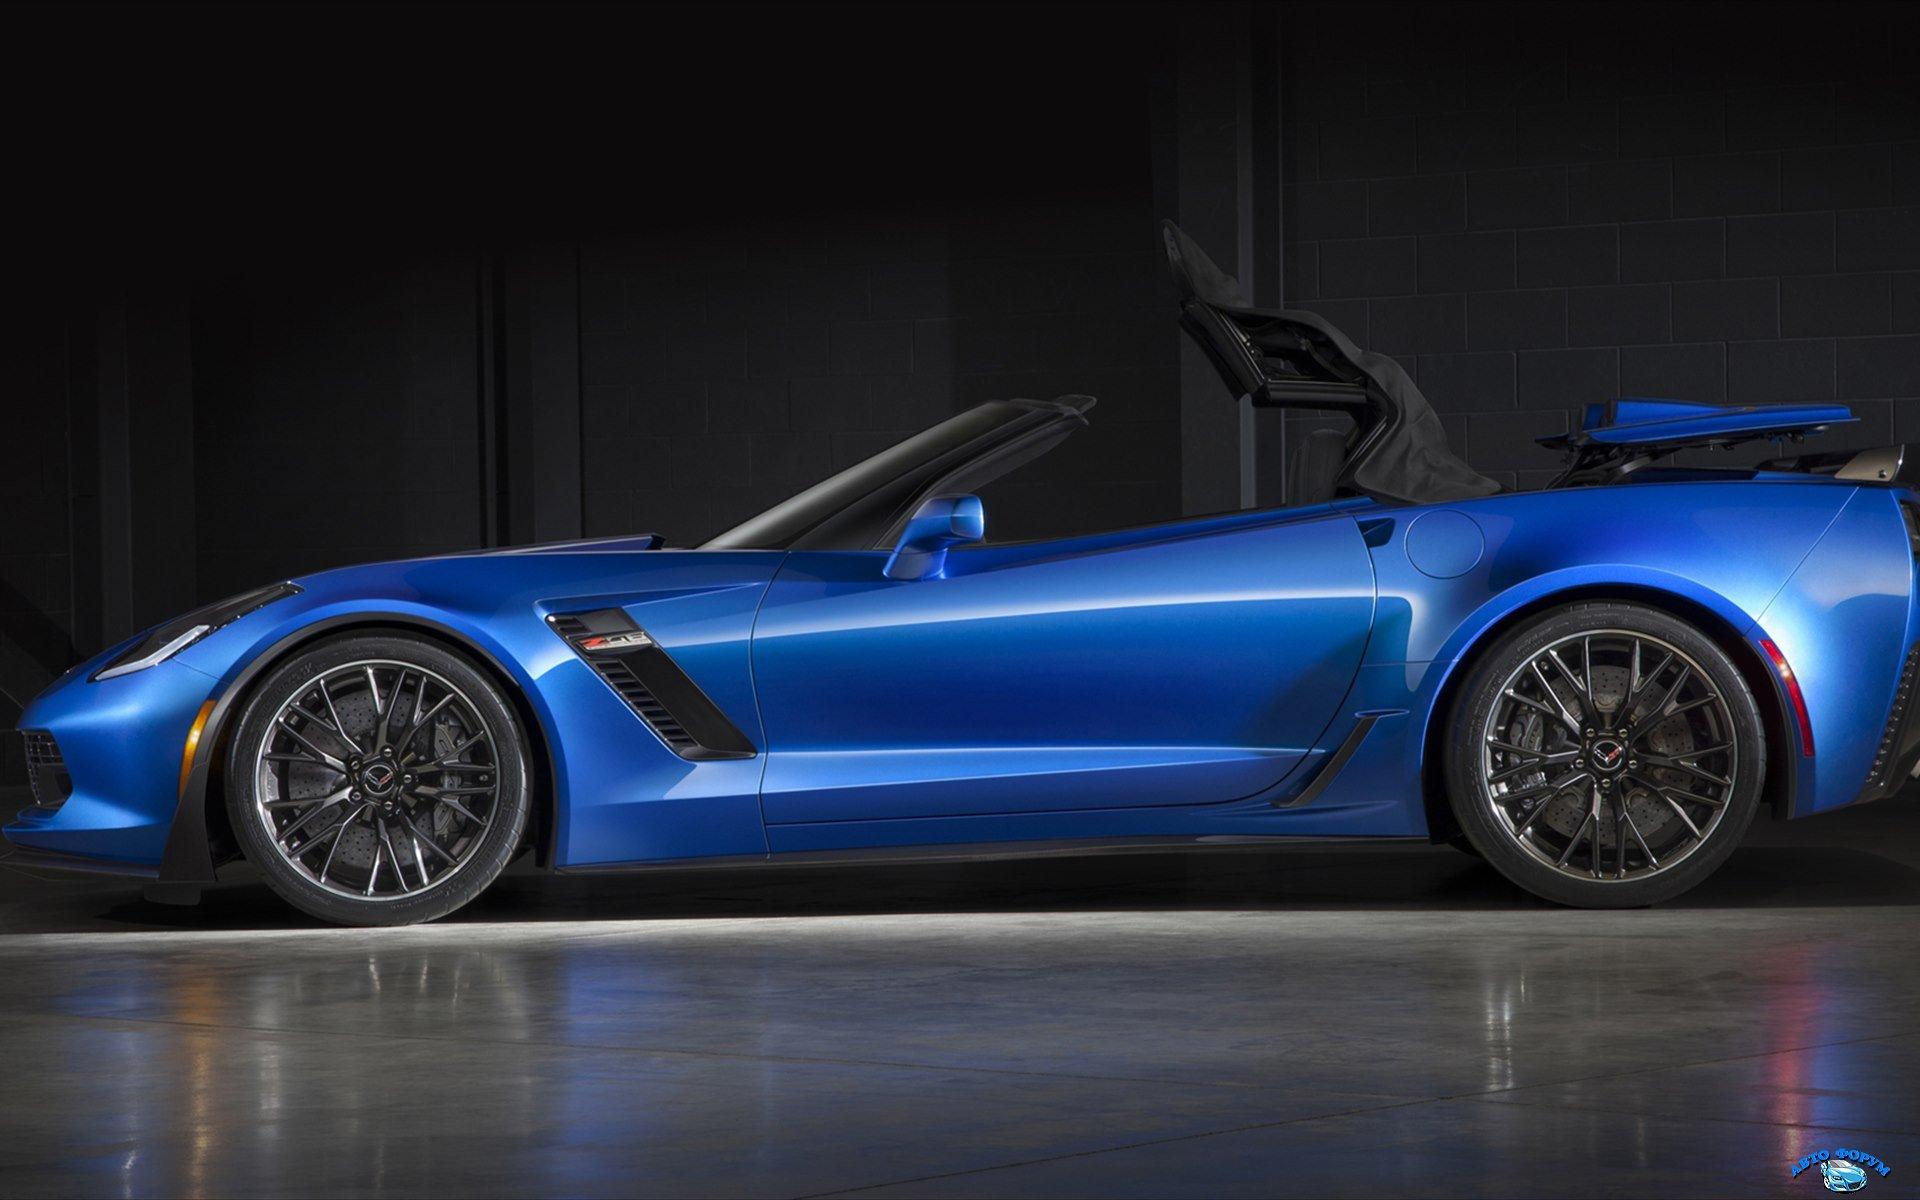 Chevrolet-Corvette-Z06-Convertible-2015-widescreen-12.jpg